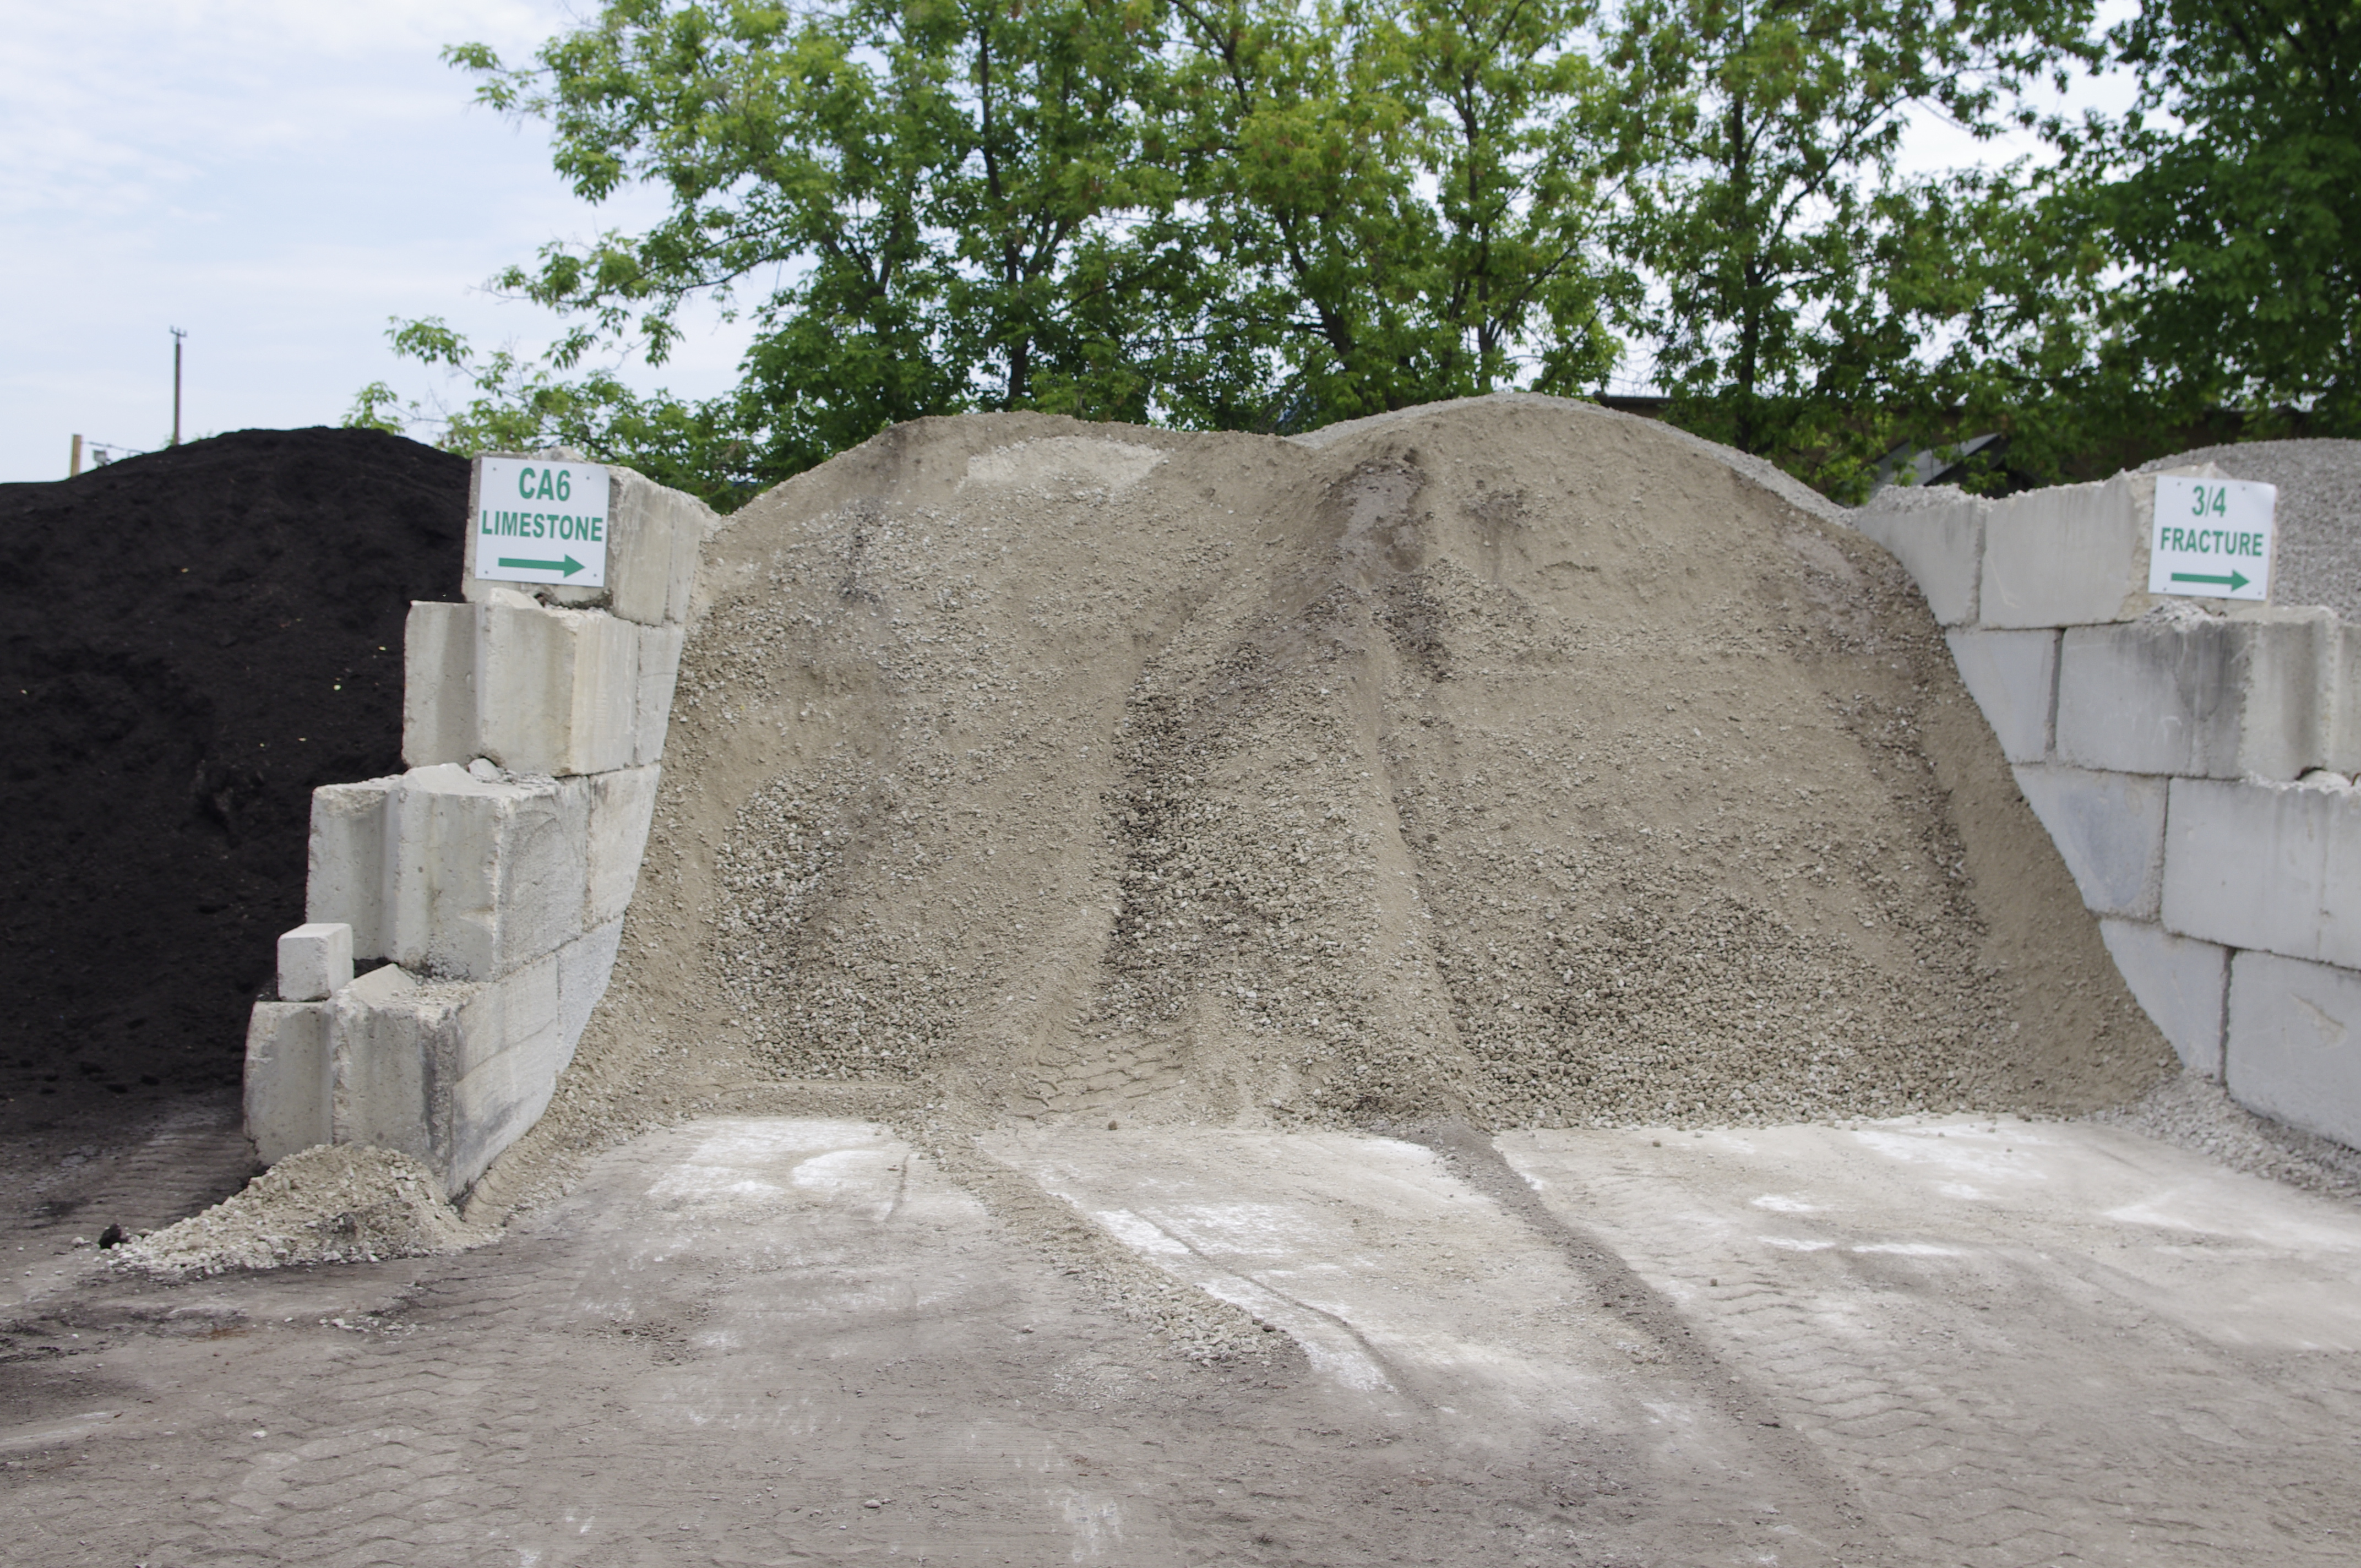 ca6 limestone